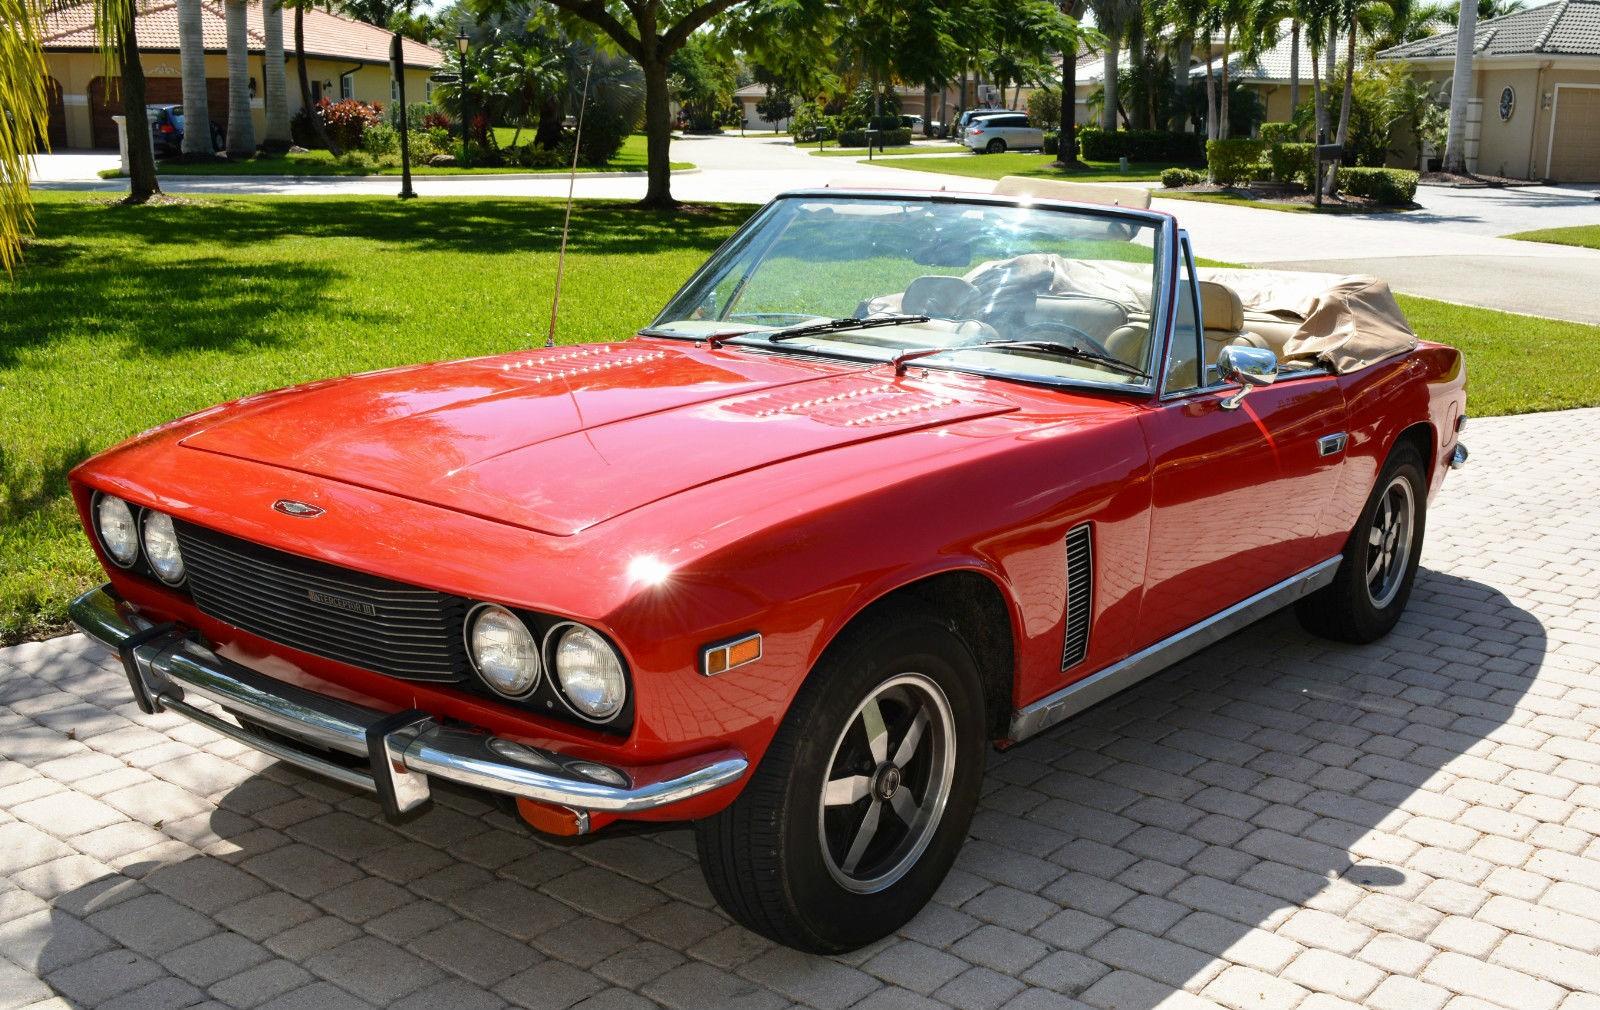 Cars Com Bill Of Sale Best Of 1976 Jensen Interceptor Convertible for Sale